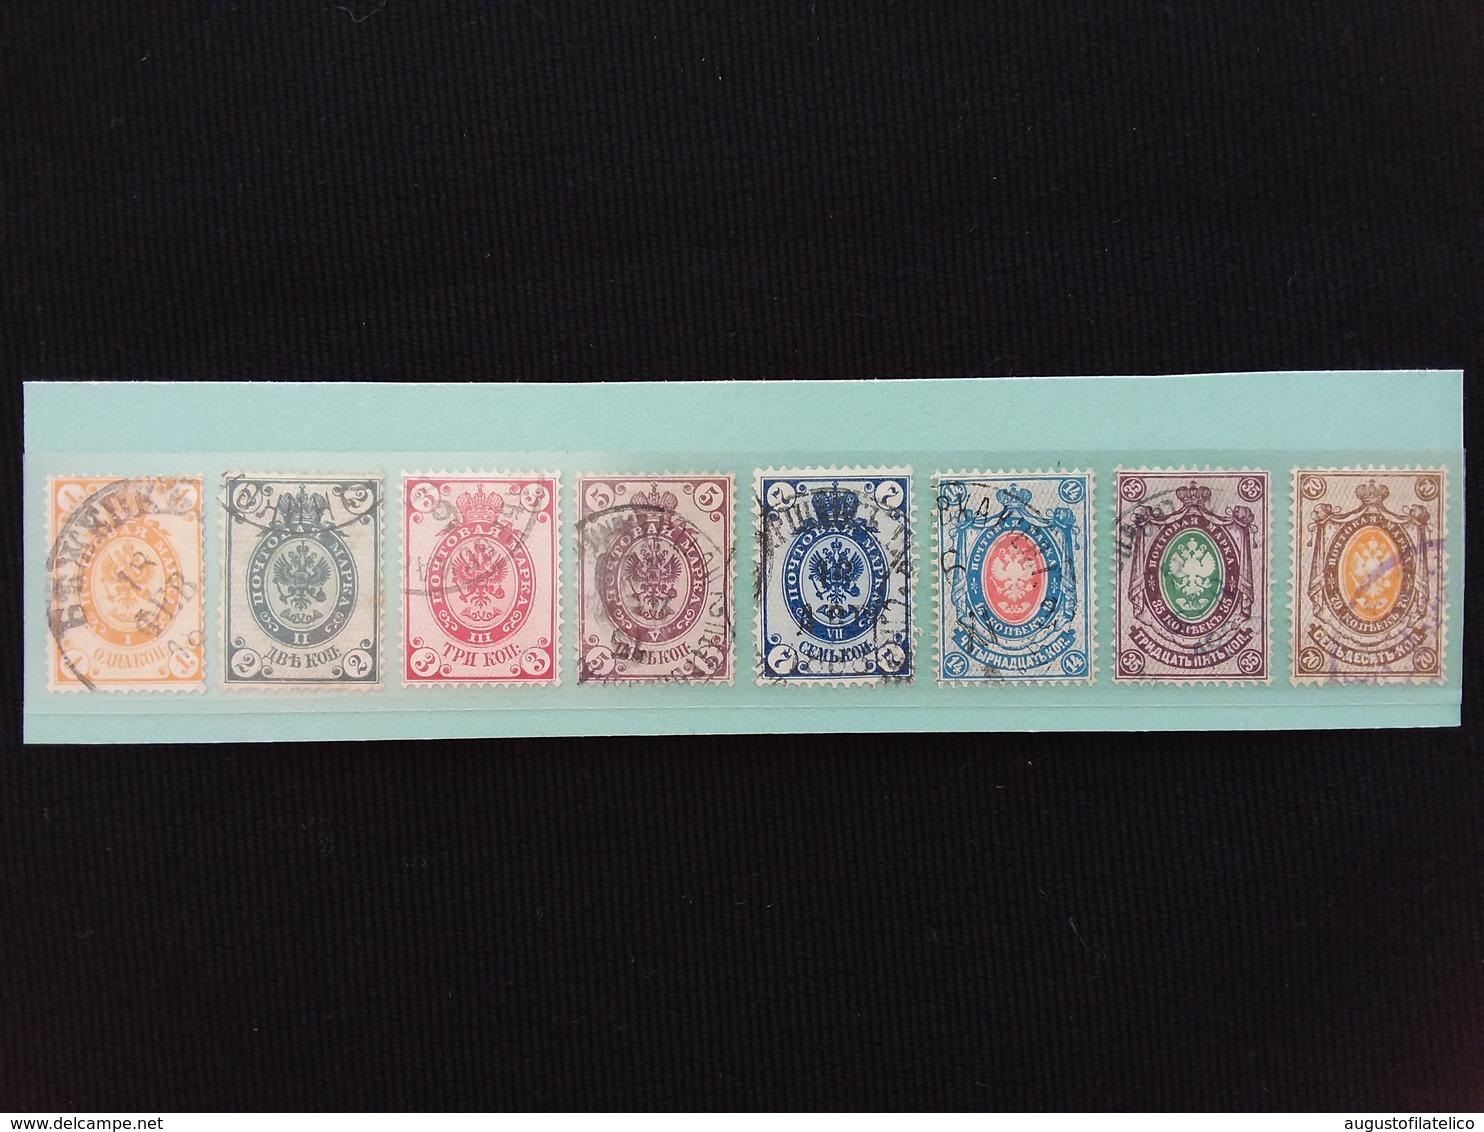 RUSSIA 1883/88 - Corno Di Posta Nn. 28/35 Timbrati + Spese Postali - 1857-1916 Impero